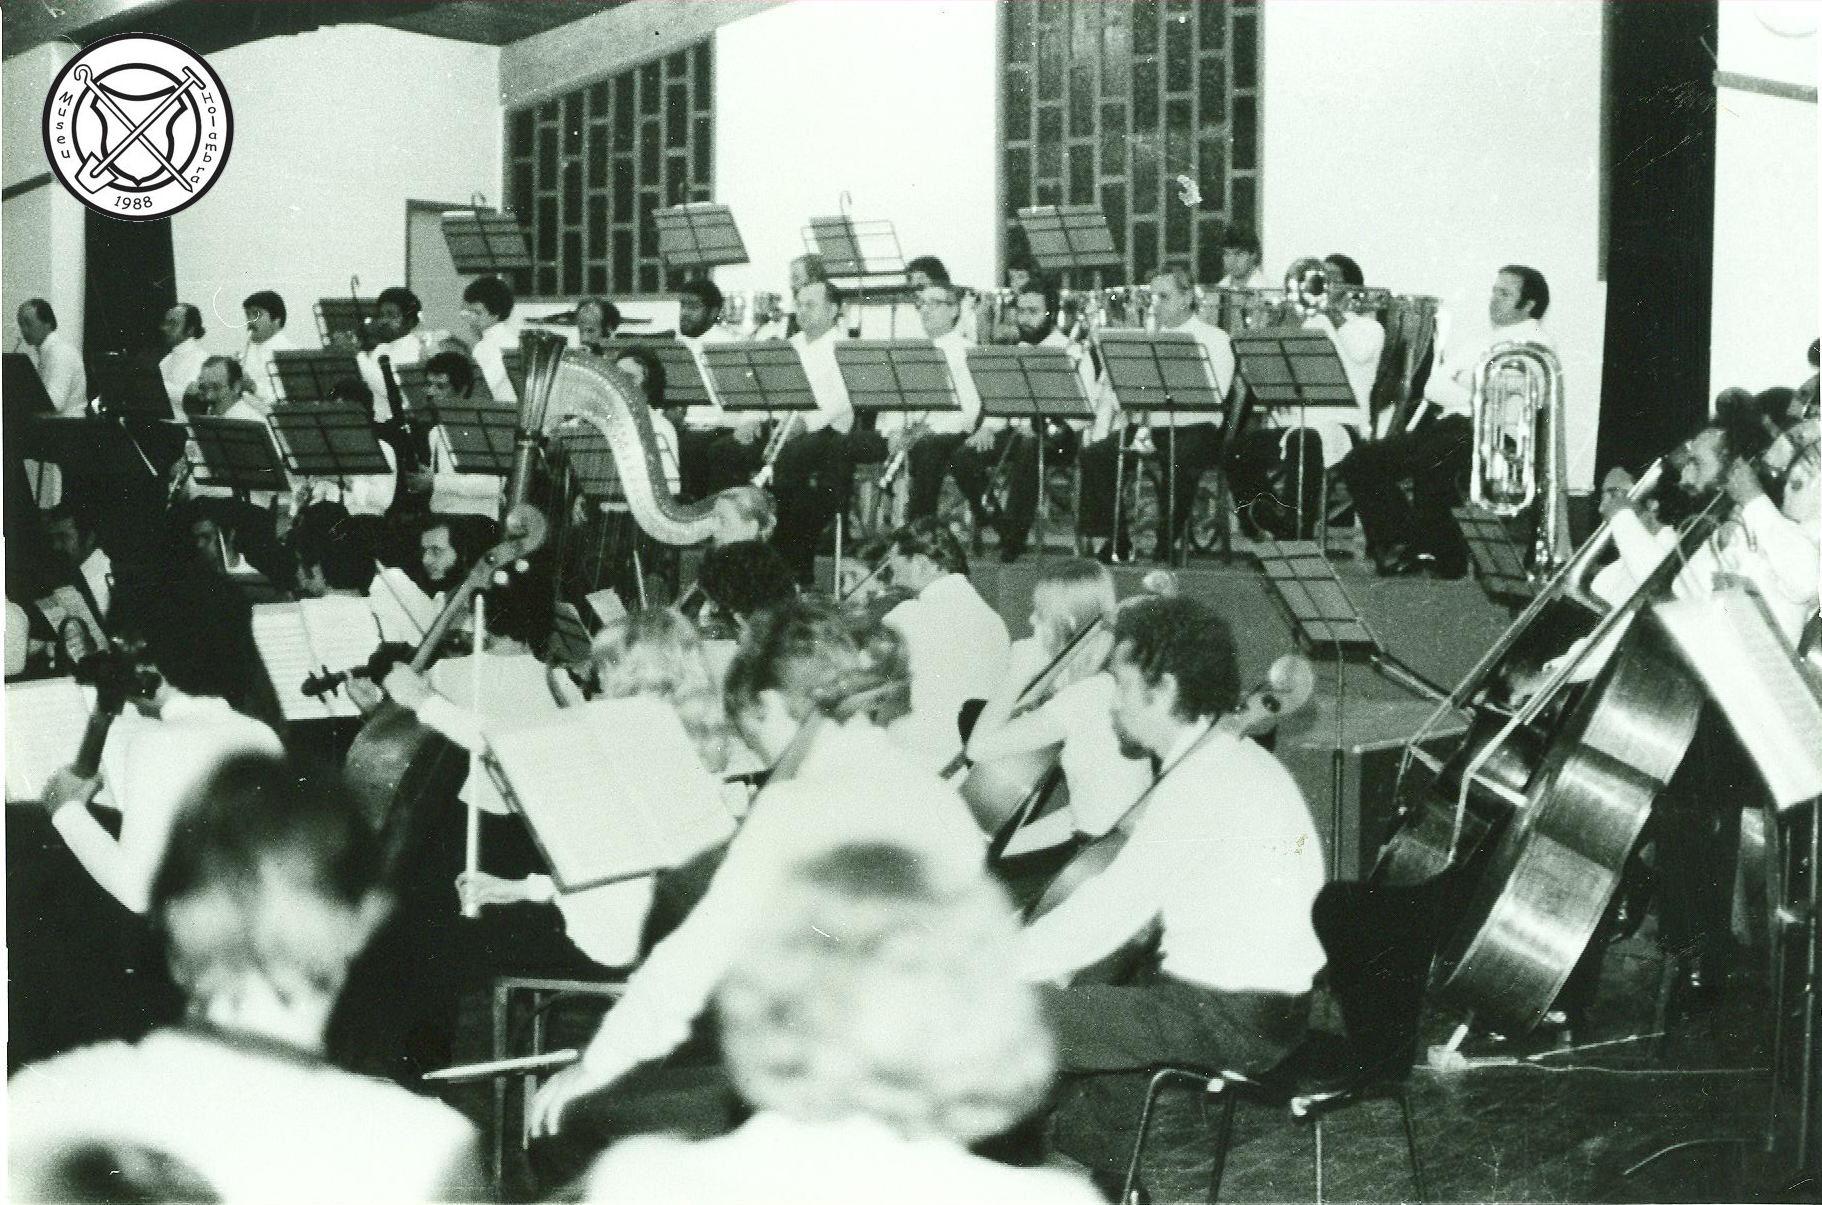 Symfonieorkest (Orquestra Sinfônica) van Campinas